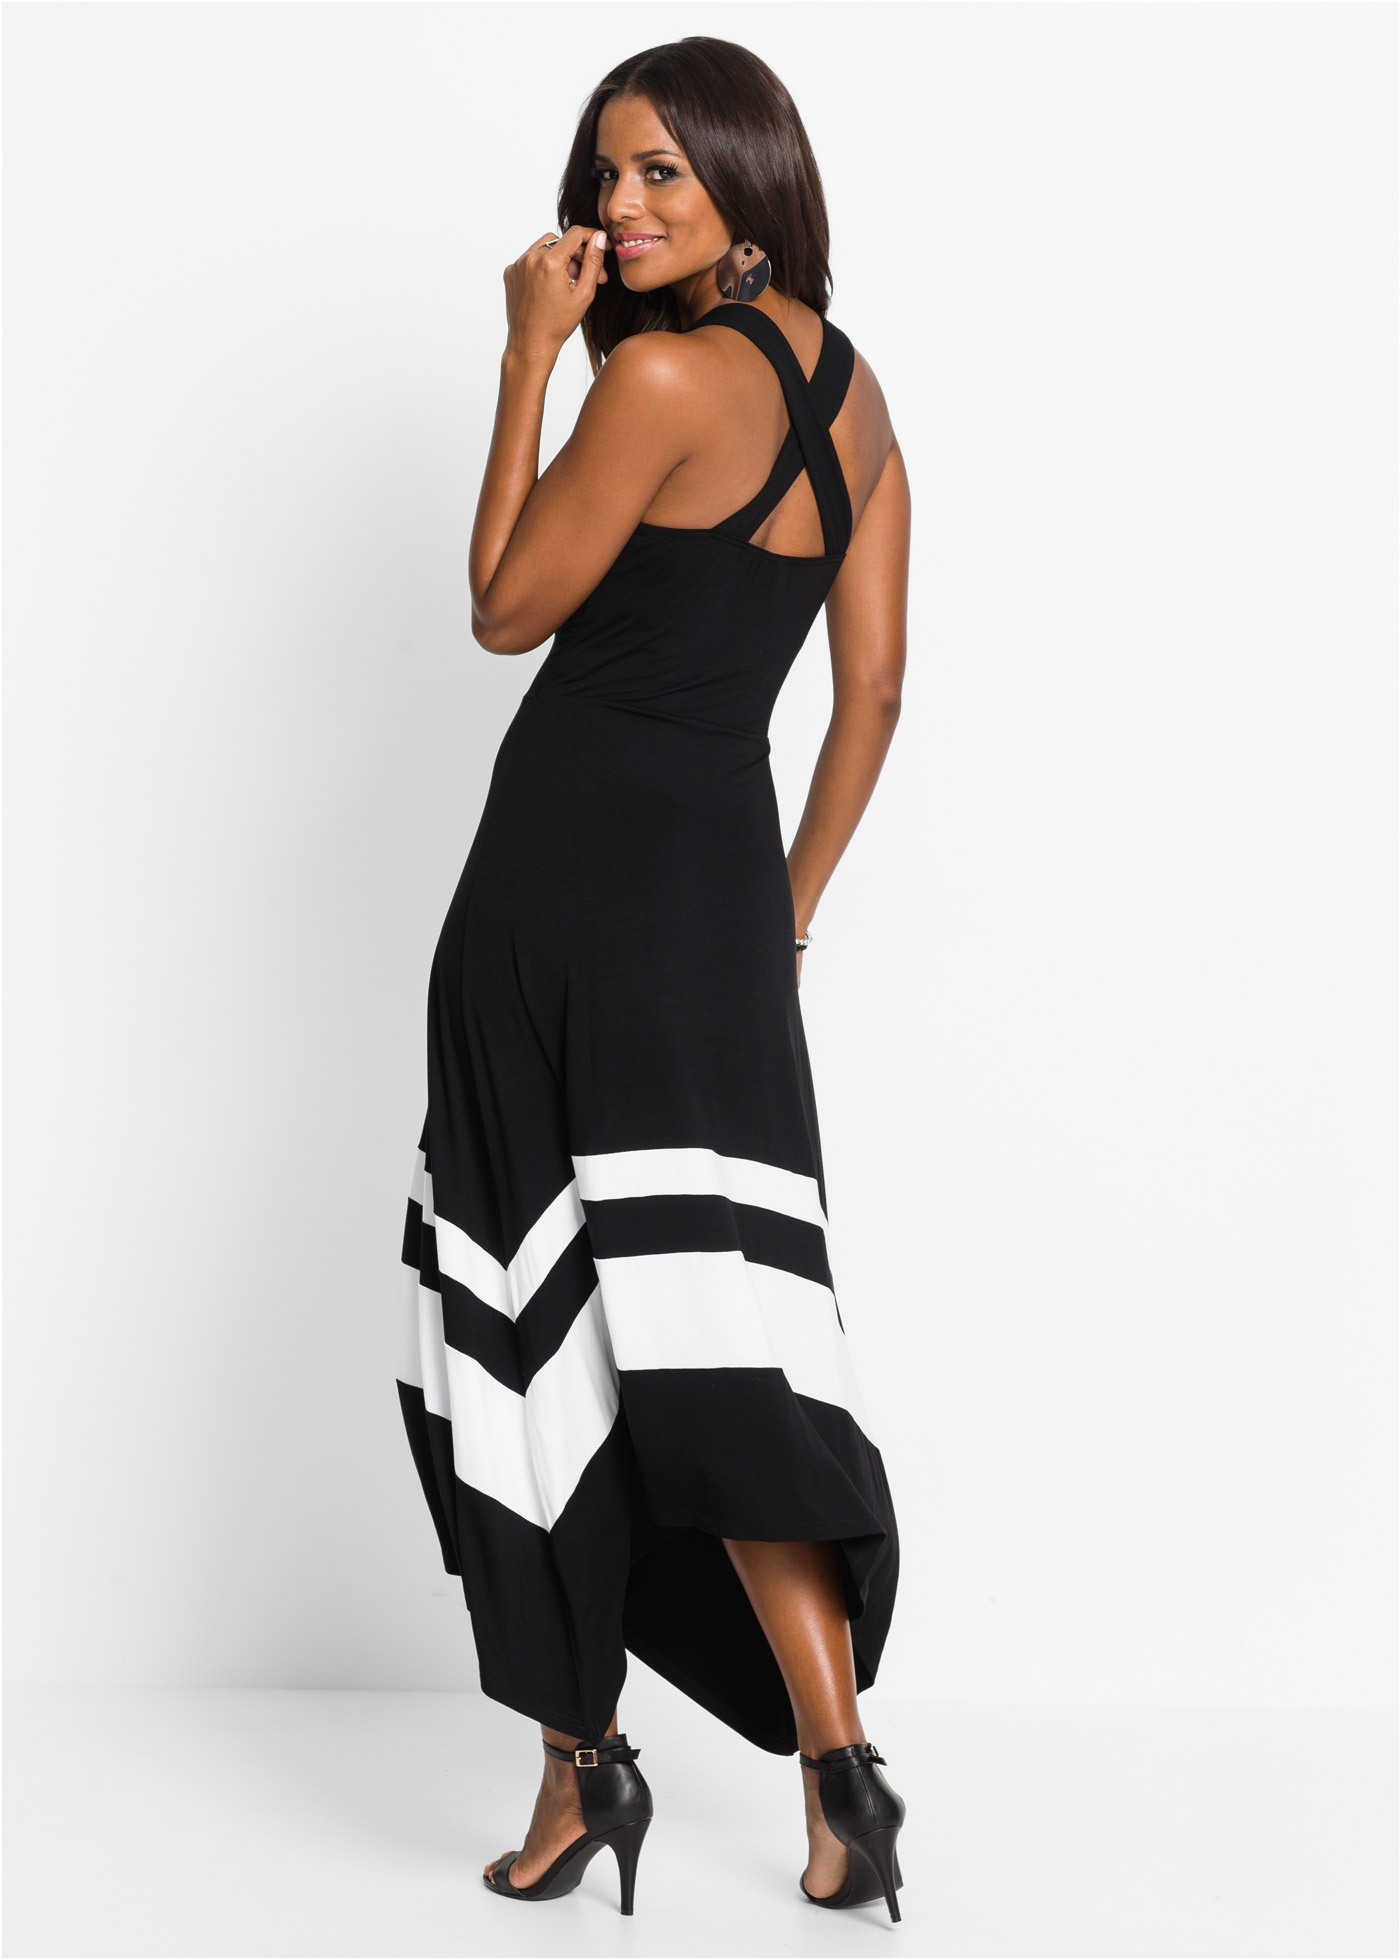 Woman's dress - Elegant Outfit - Italian Fashion